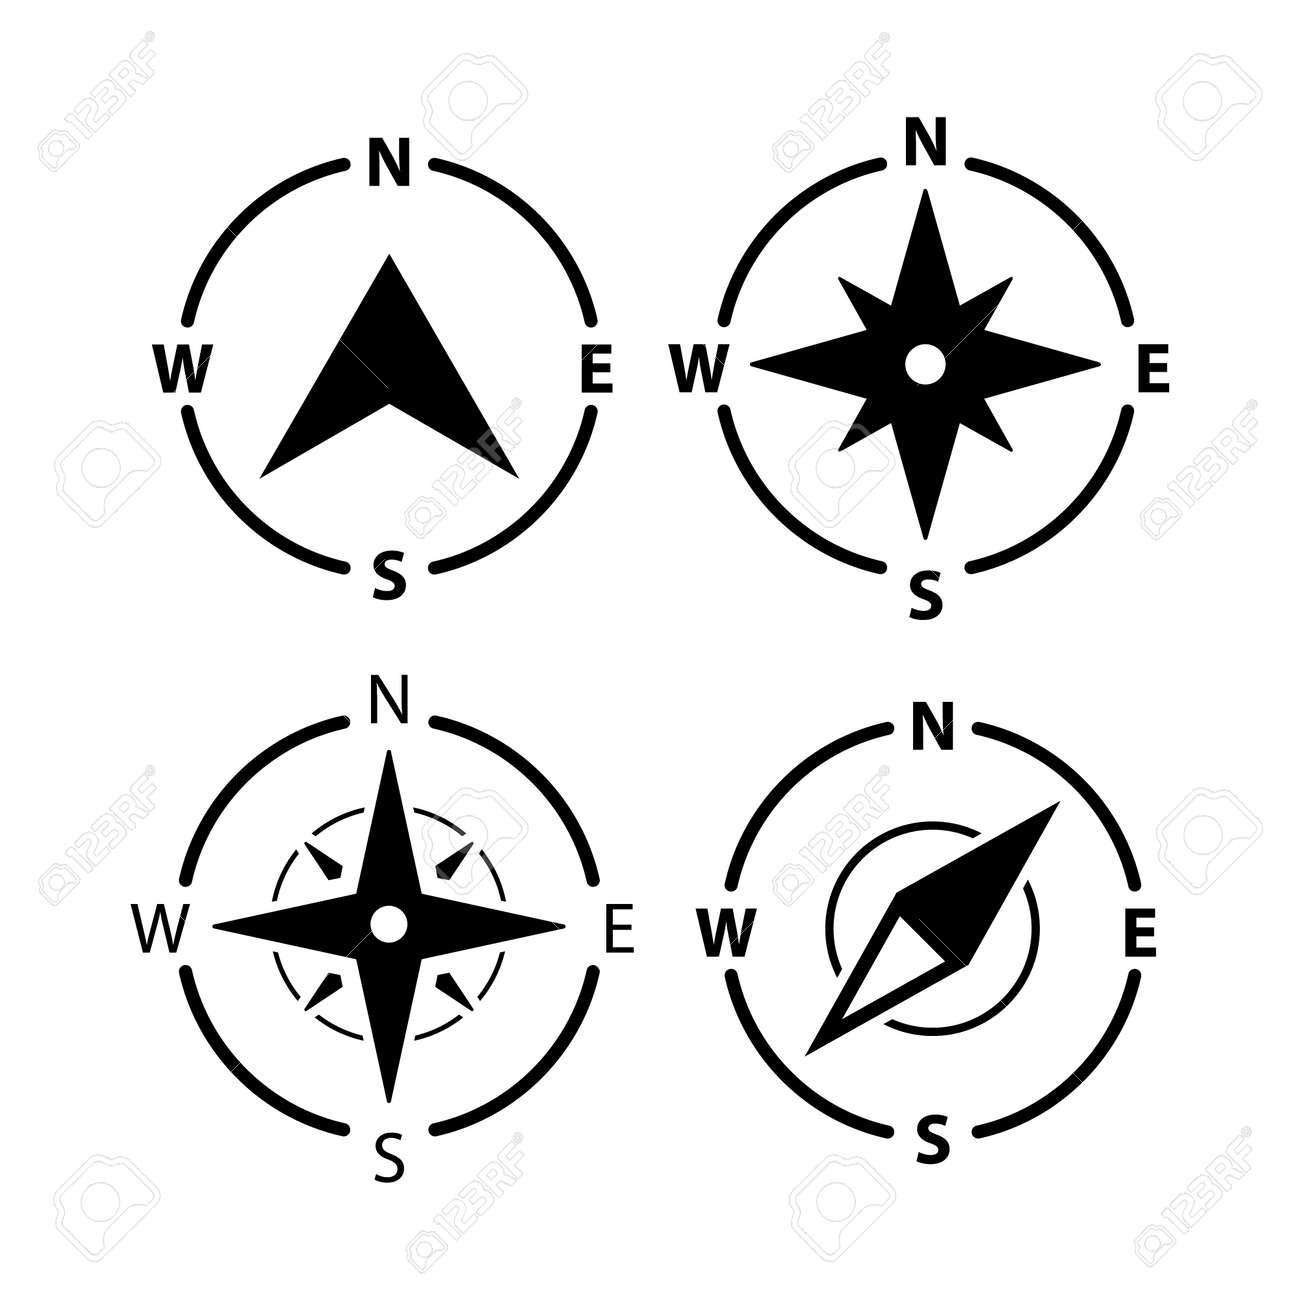 Compass logo icon. North vector arrow orienteering compass map gps navigator - 168932600